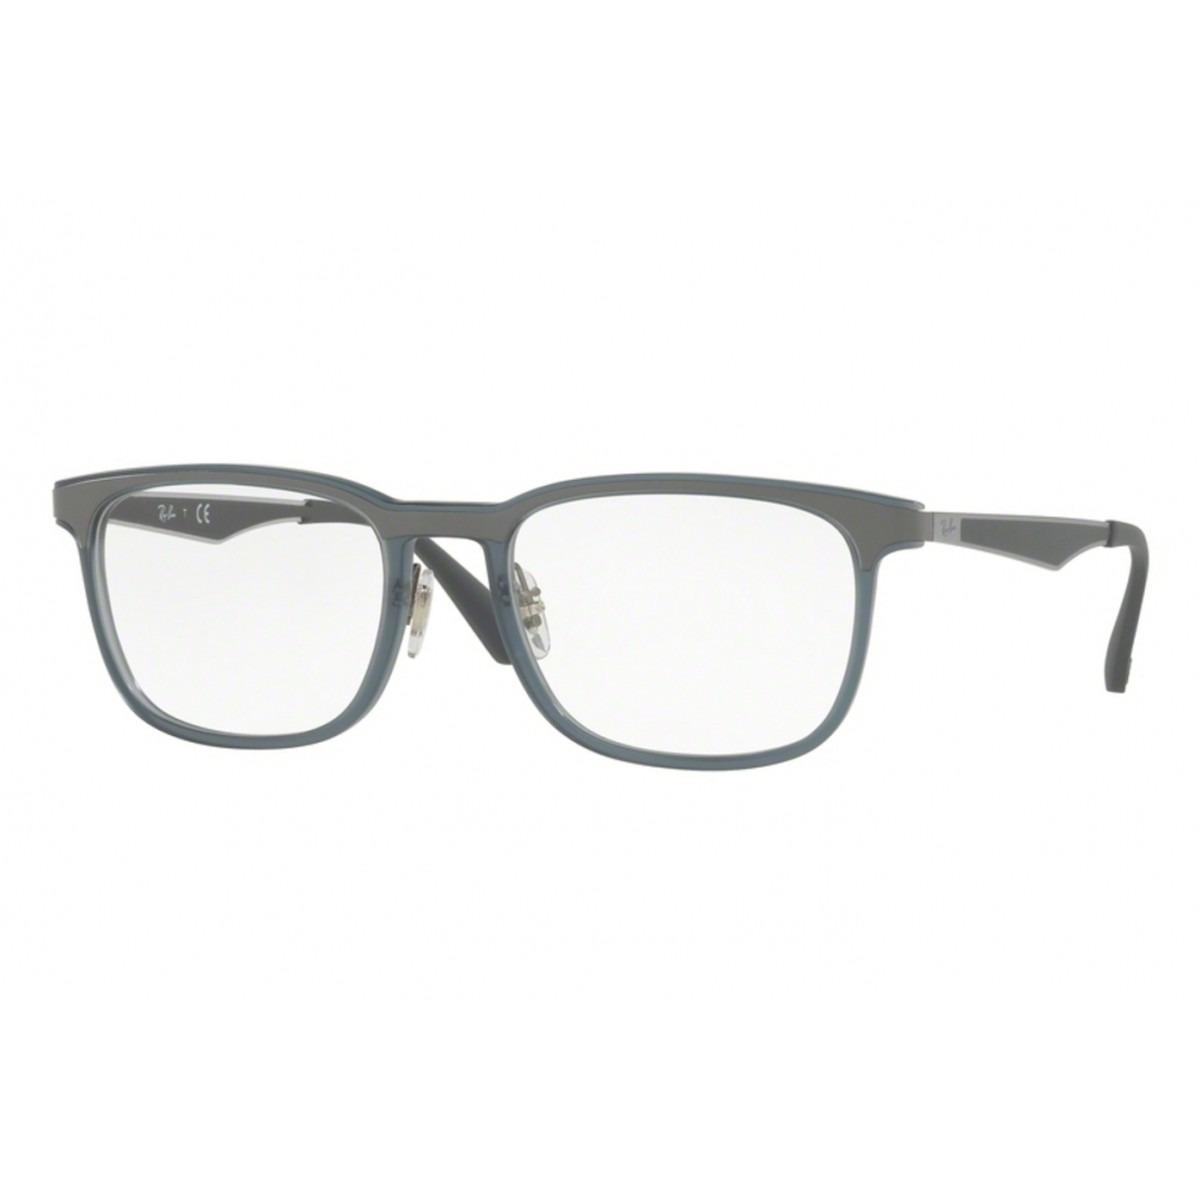 eb2a60dd3 óculos de grau ray ban original masculino rb7163 5679 tam.55. Carregando  zoom.